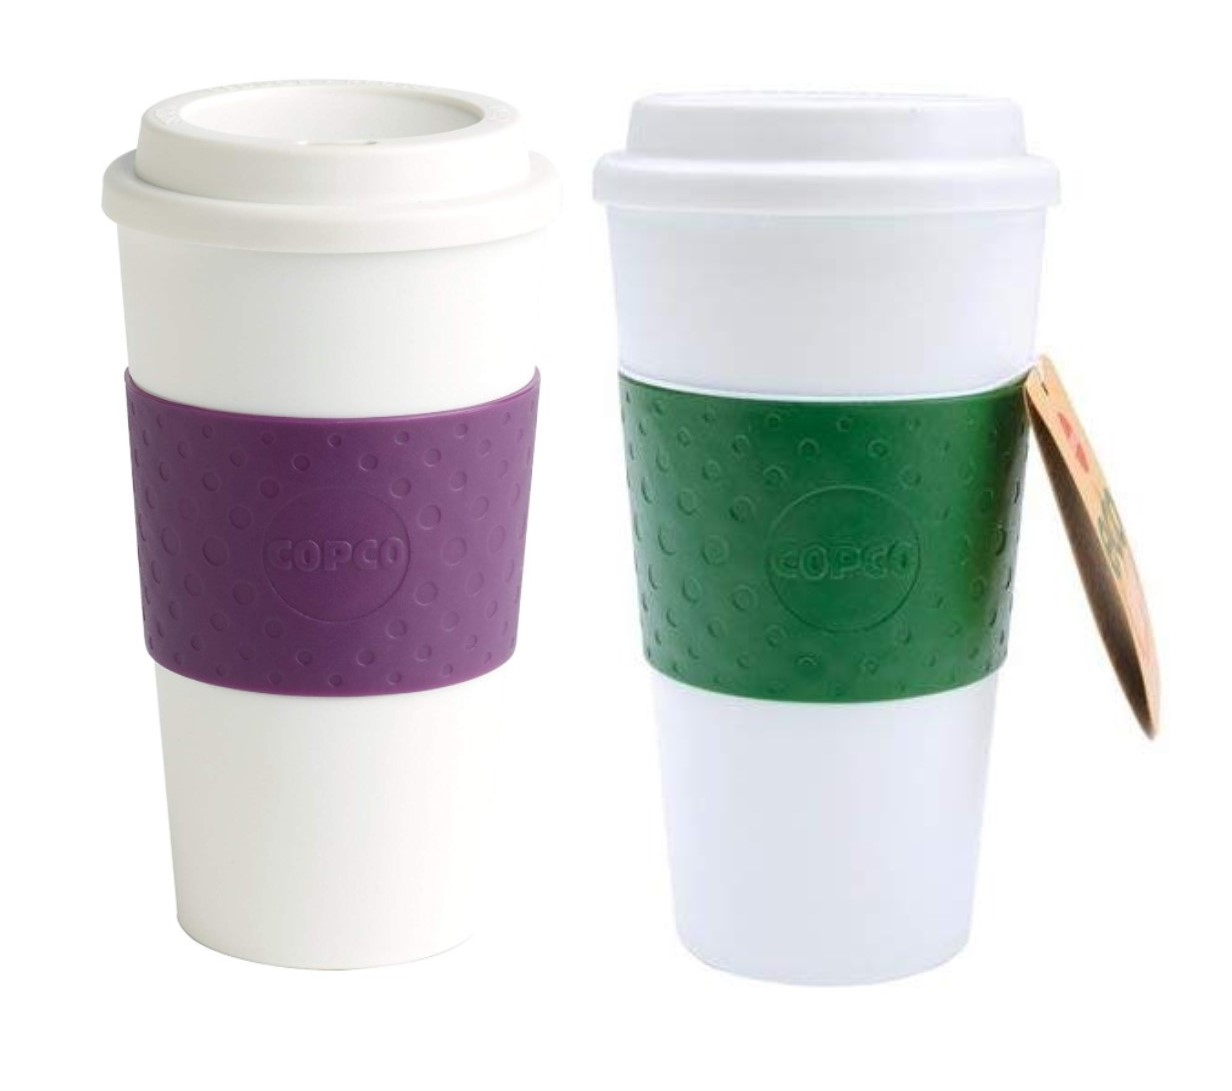 Copco Acadia Coffee Mug Reusable Insulated BPA Free 16 oz 2 Pack Brown Blue